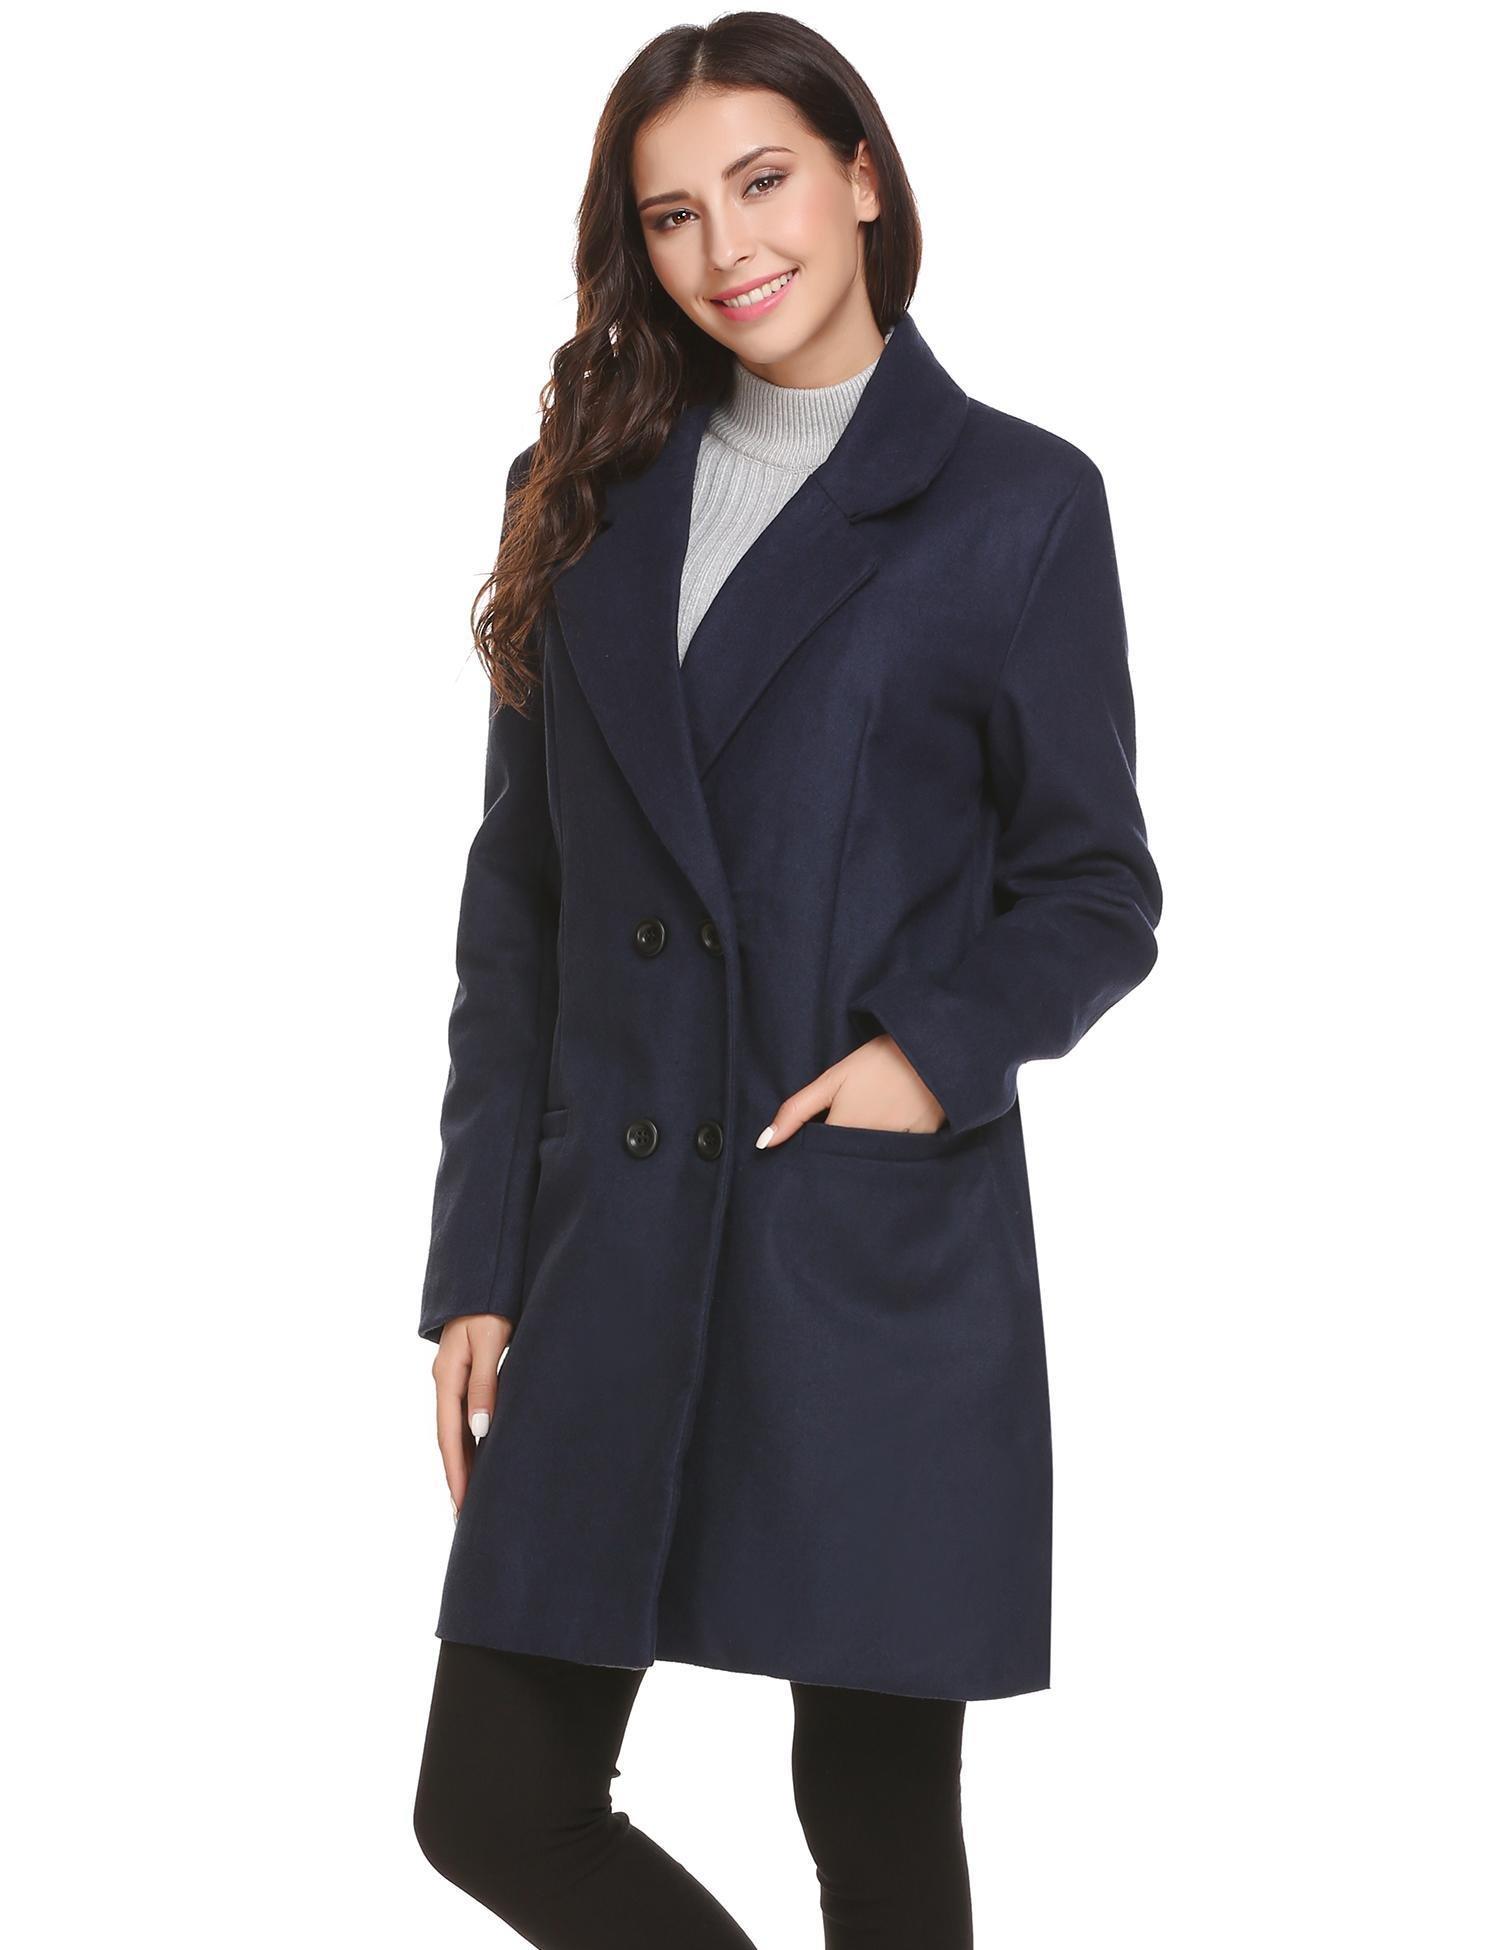 HOTOUCH Women's New Style Winter Dress-Coats Slim Long Woolen Pea Coat Navy Blue L